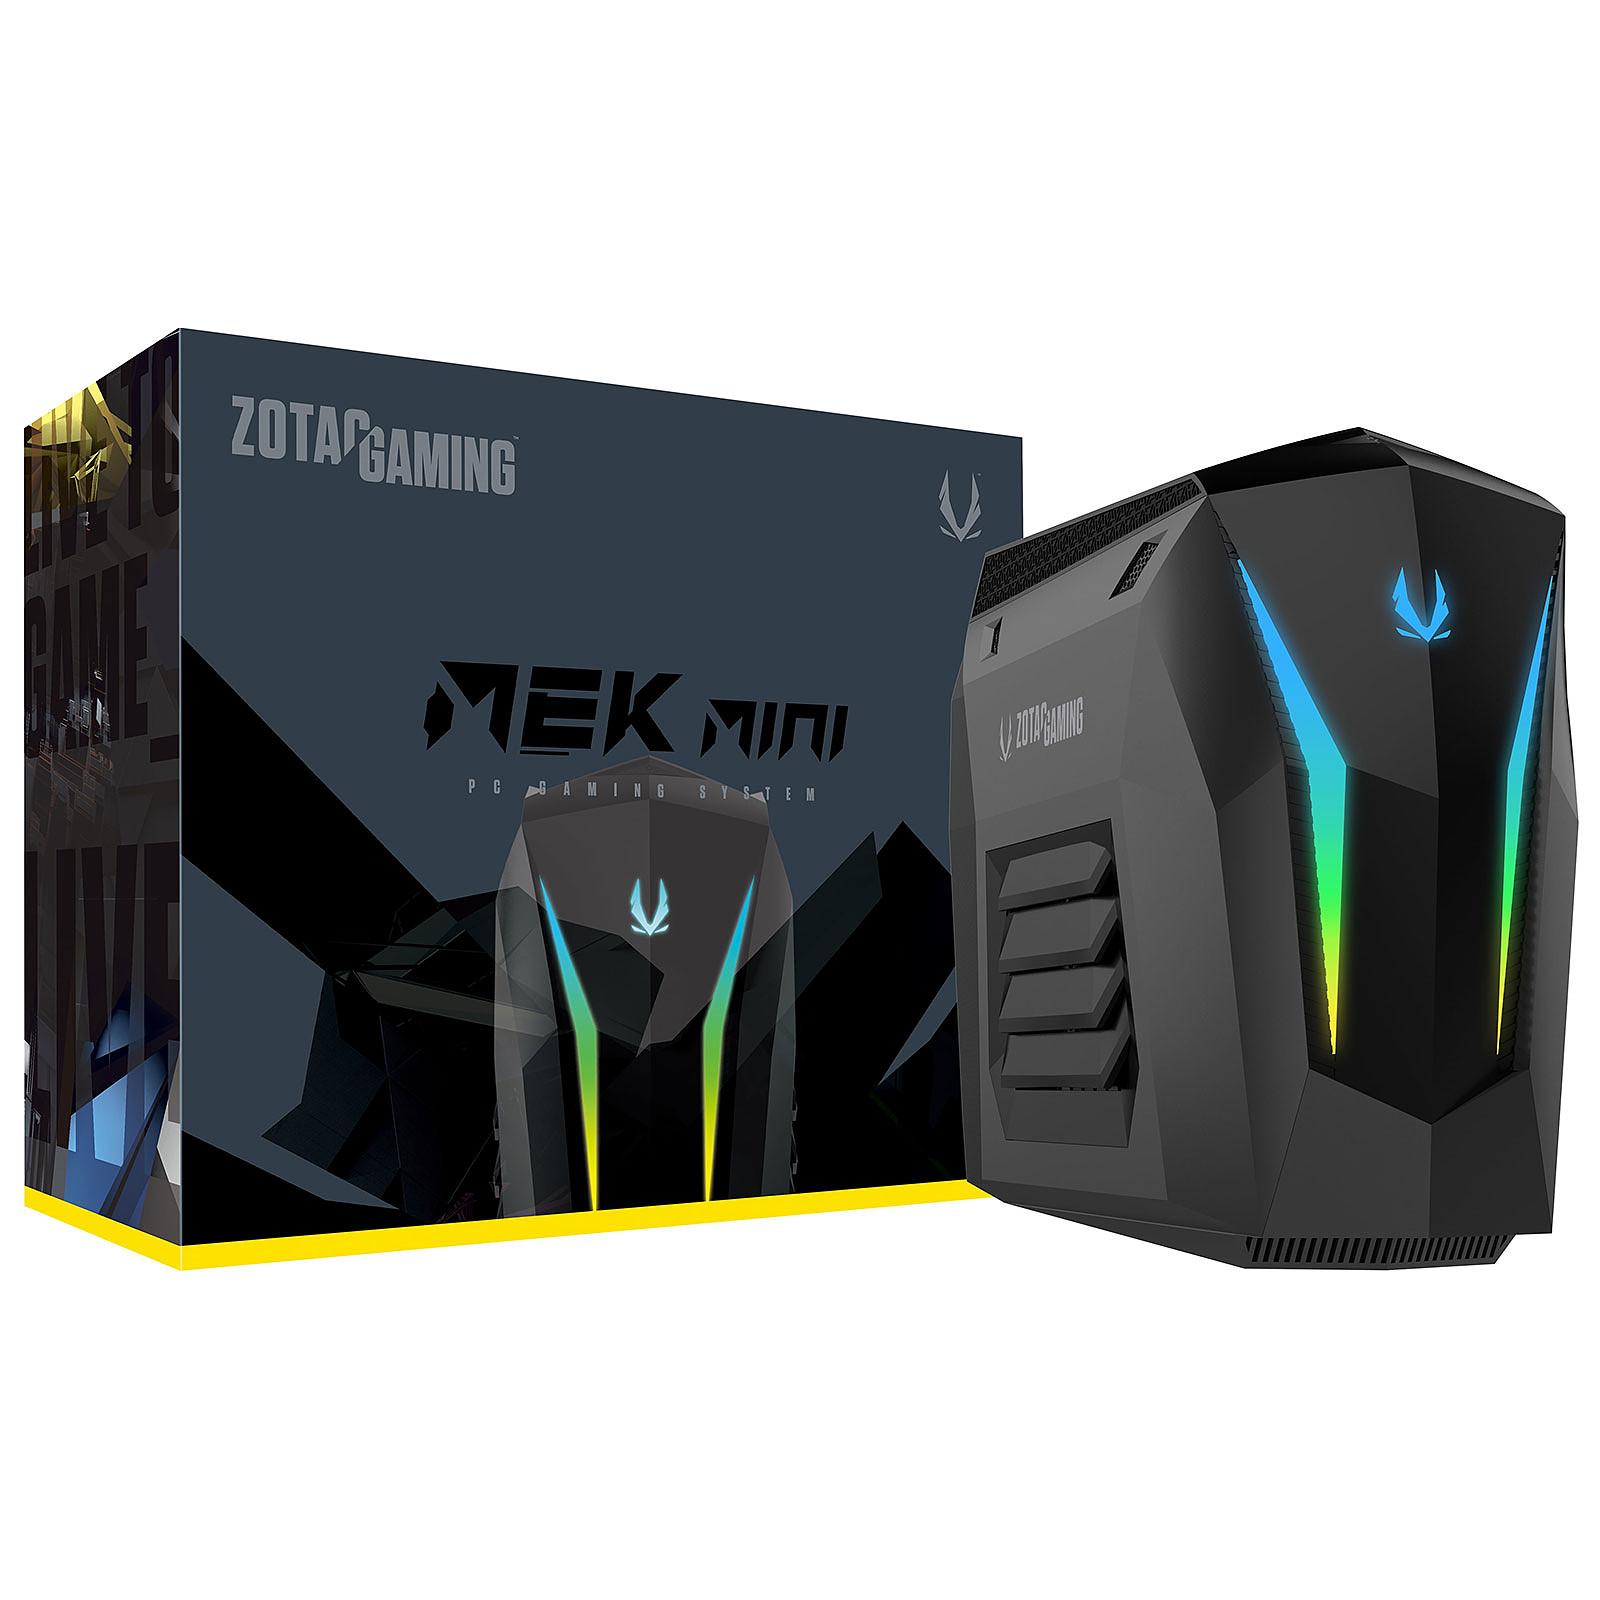 ZOTAC MEK MINI (GM2060C5R1B)